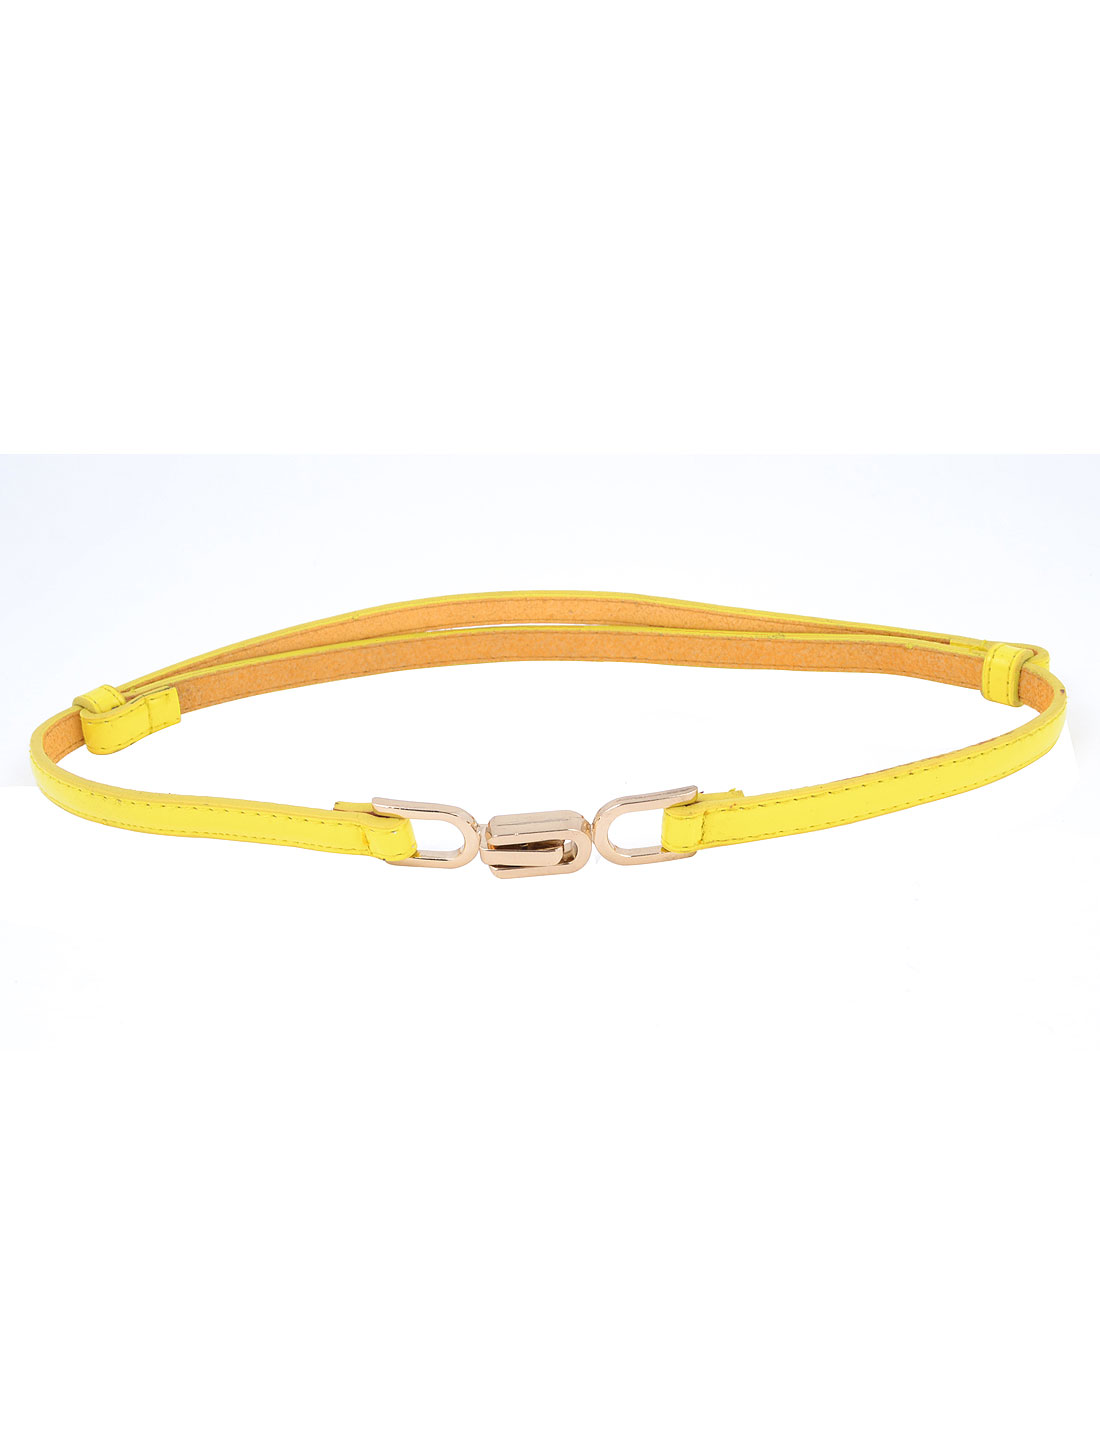 Women Dress Shirt Decor Interlocking Buckle Patent Leather Adjustable 1.2cm Width Waist Band Belt Yellow